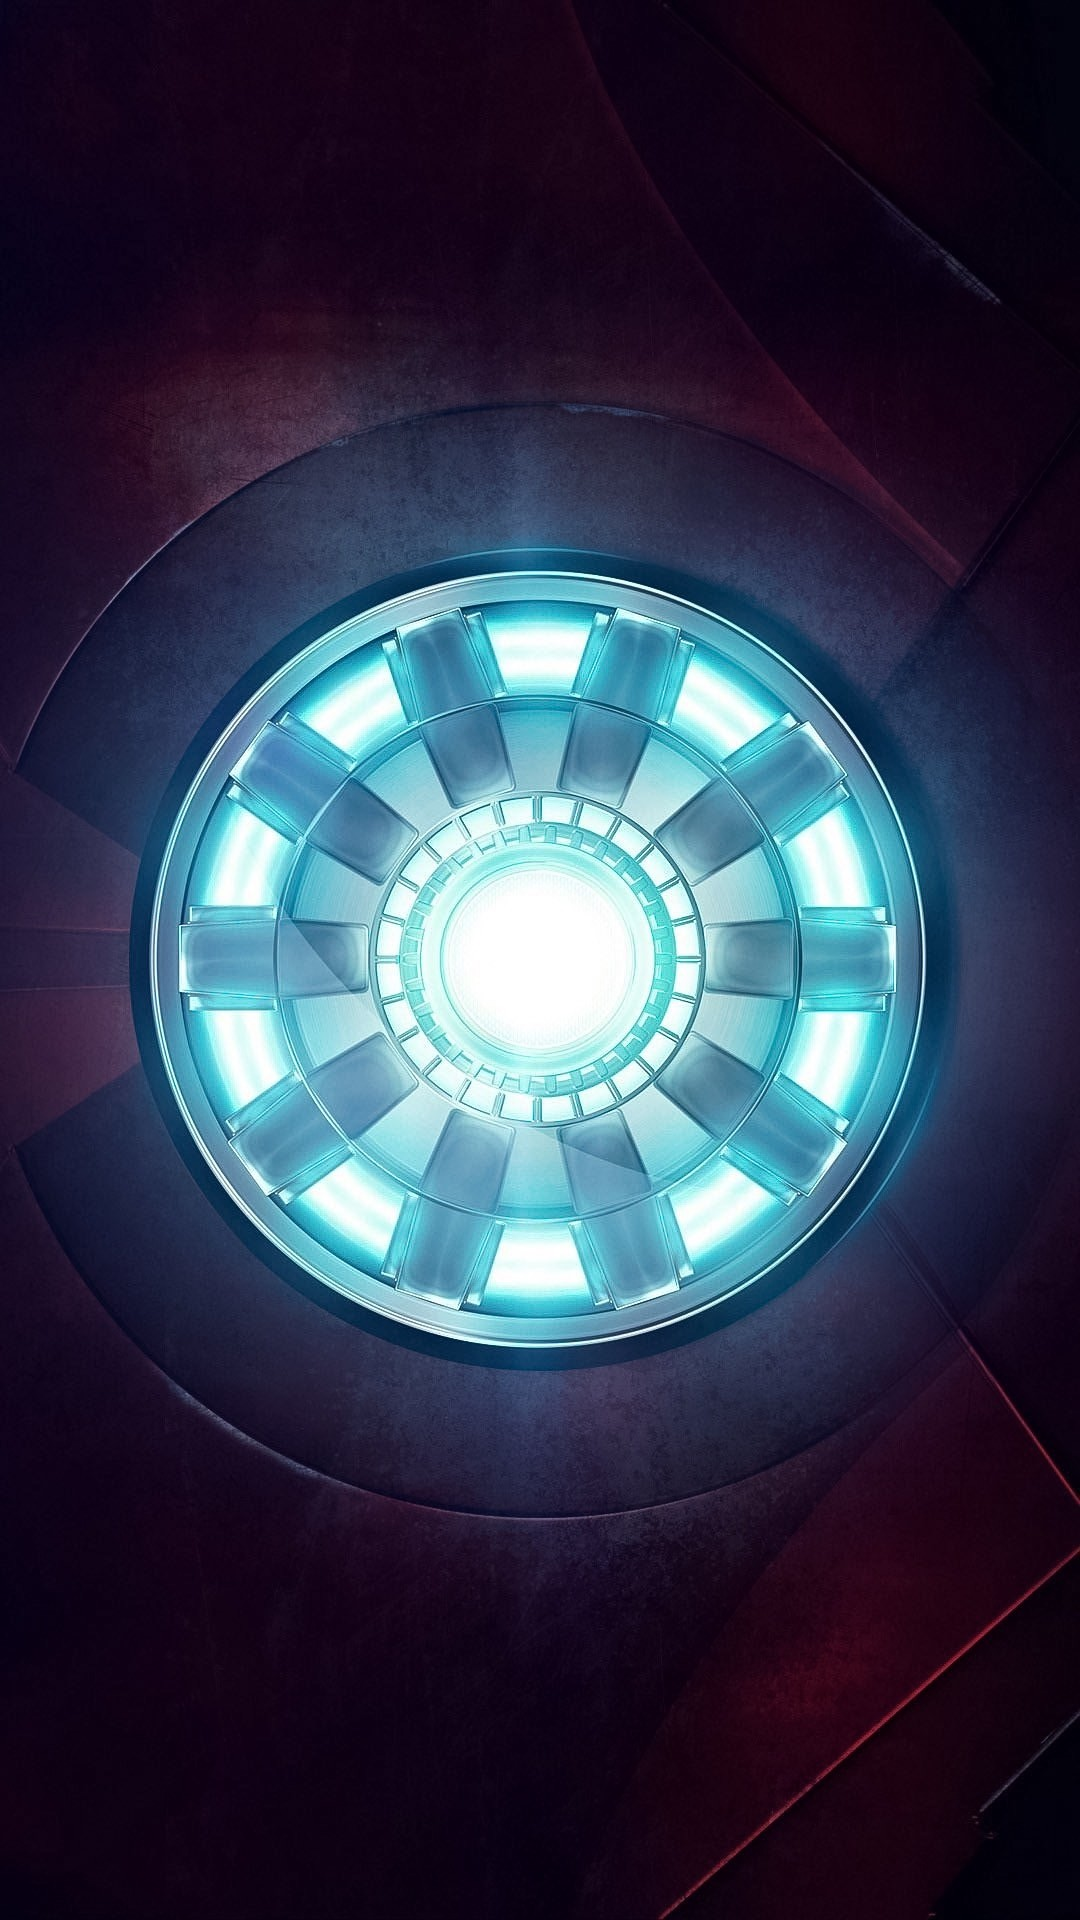 Top 25+ best Wallpaper iron man ideas on Pinterest | Ironman, Iron man  superheroe and Marvel comics wallpaper